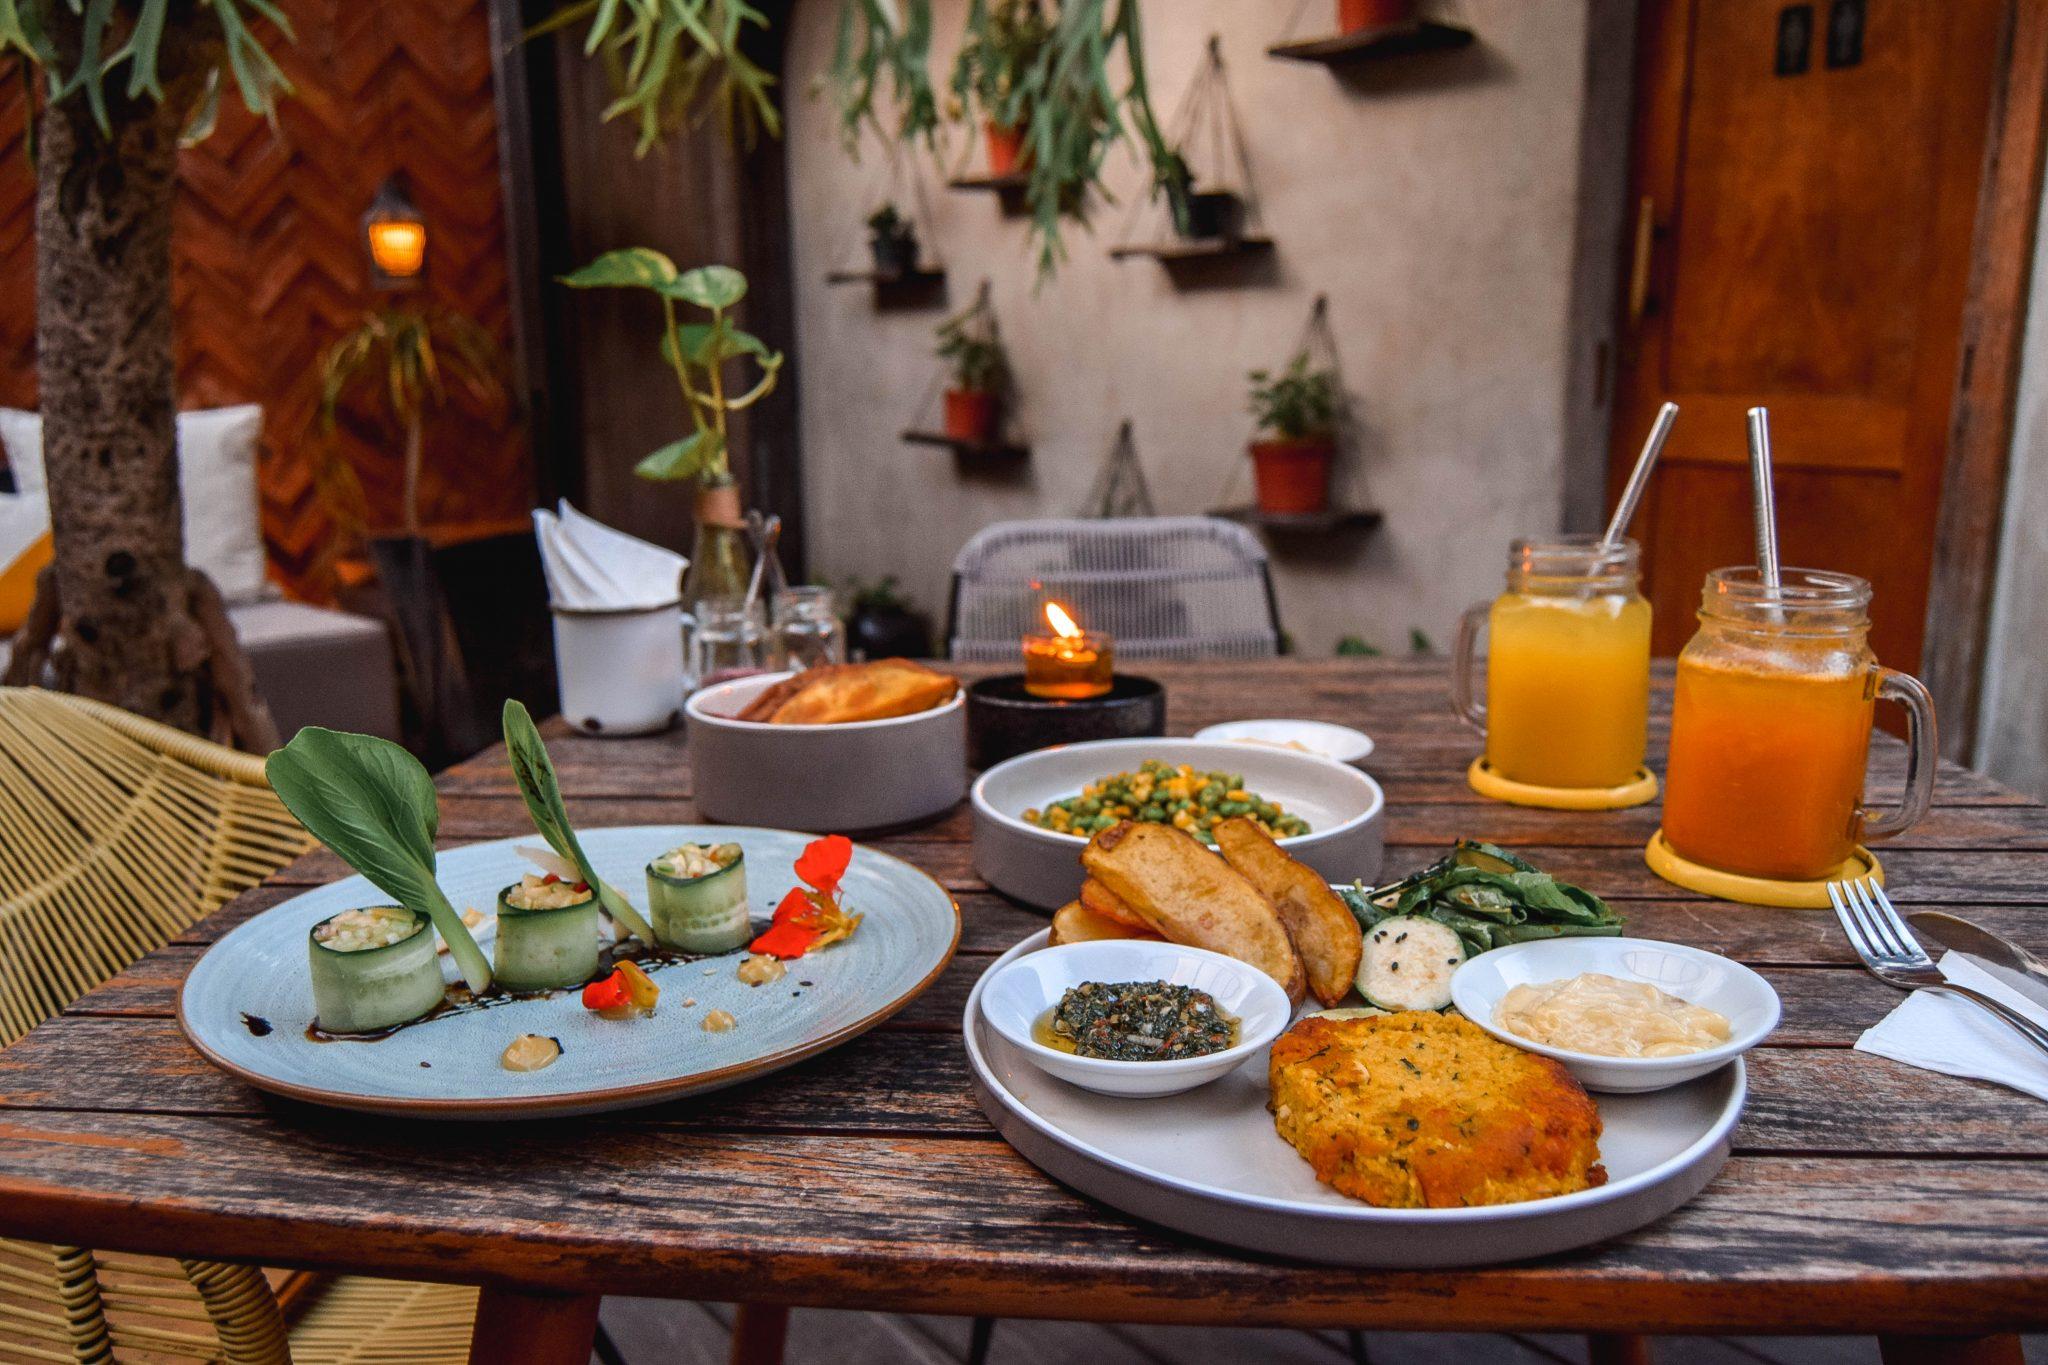 Wanderers & Warriors - The Savage Kitchen Bali Berawa - Best Restaurants In Bali Restaurants - Best Restaurants In Canggu